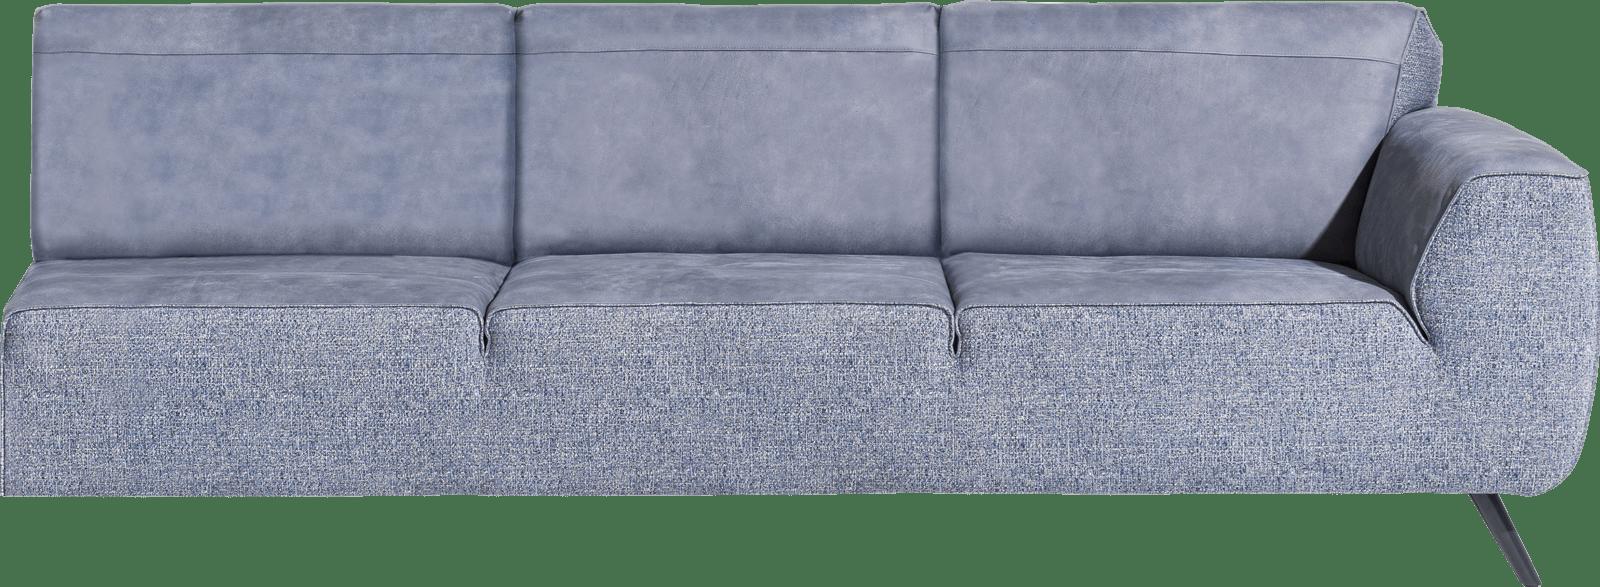 XOOON - Lima - Design minimaliste - Canapes - 4-places accoudoir droite